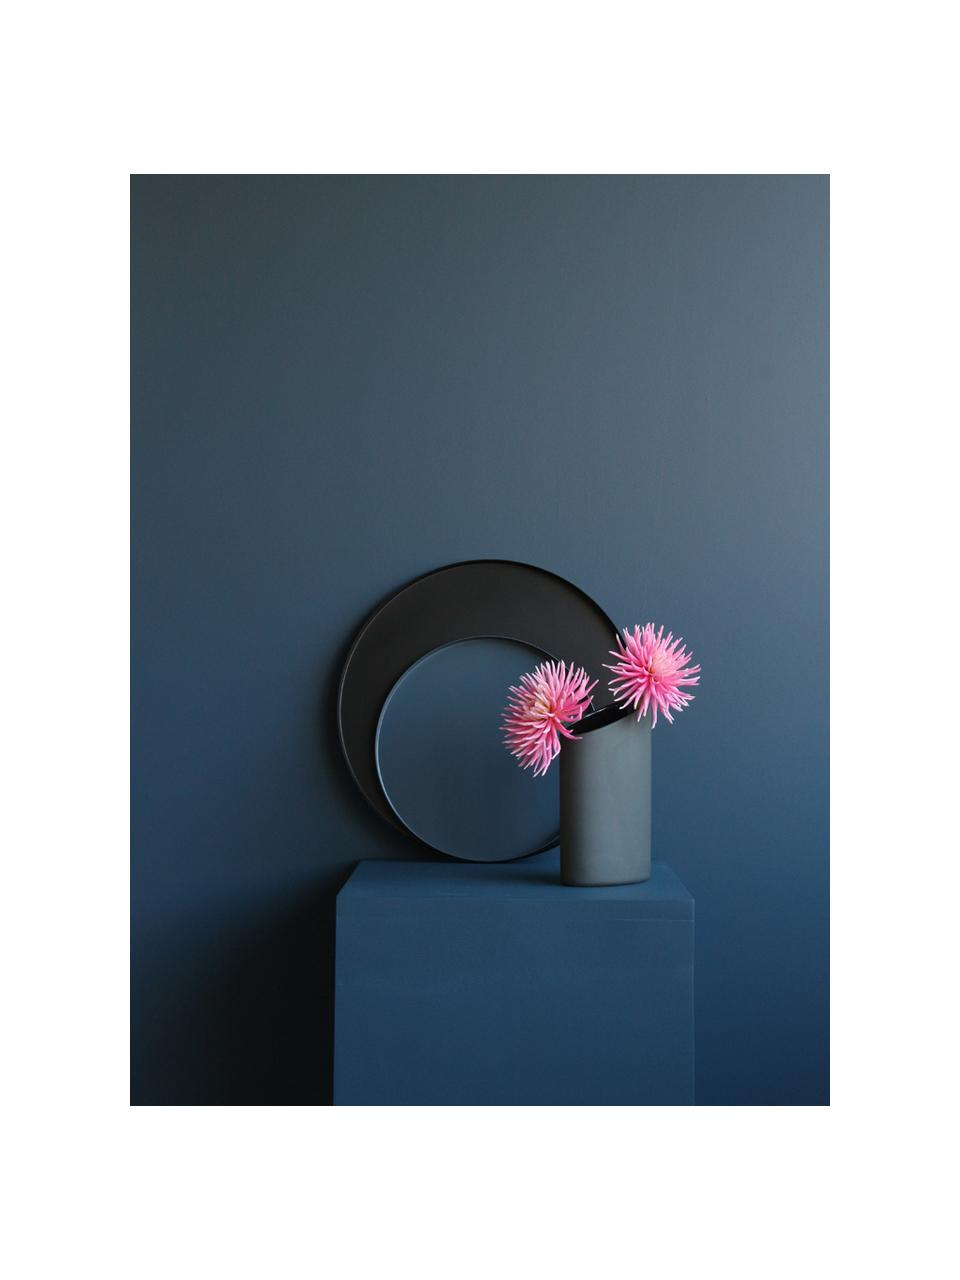 Vassoio decorativo rotondo Cerchio, Acciaio inossidabile, verniciato a polvere, Nero opaco, Ø 40 x Alt. 2 cm